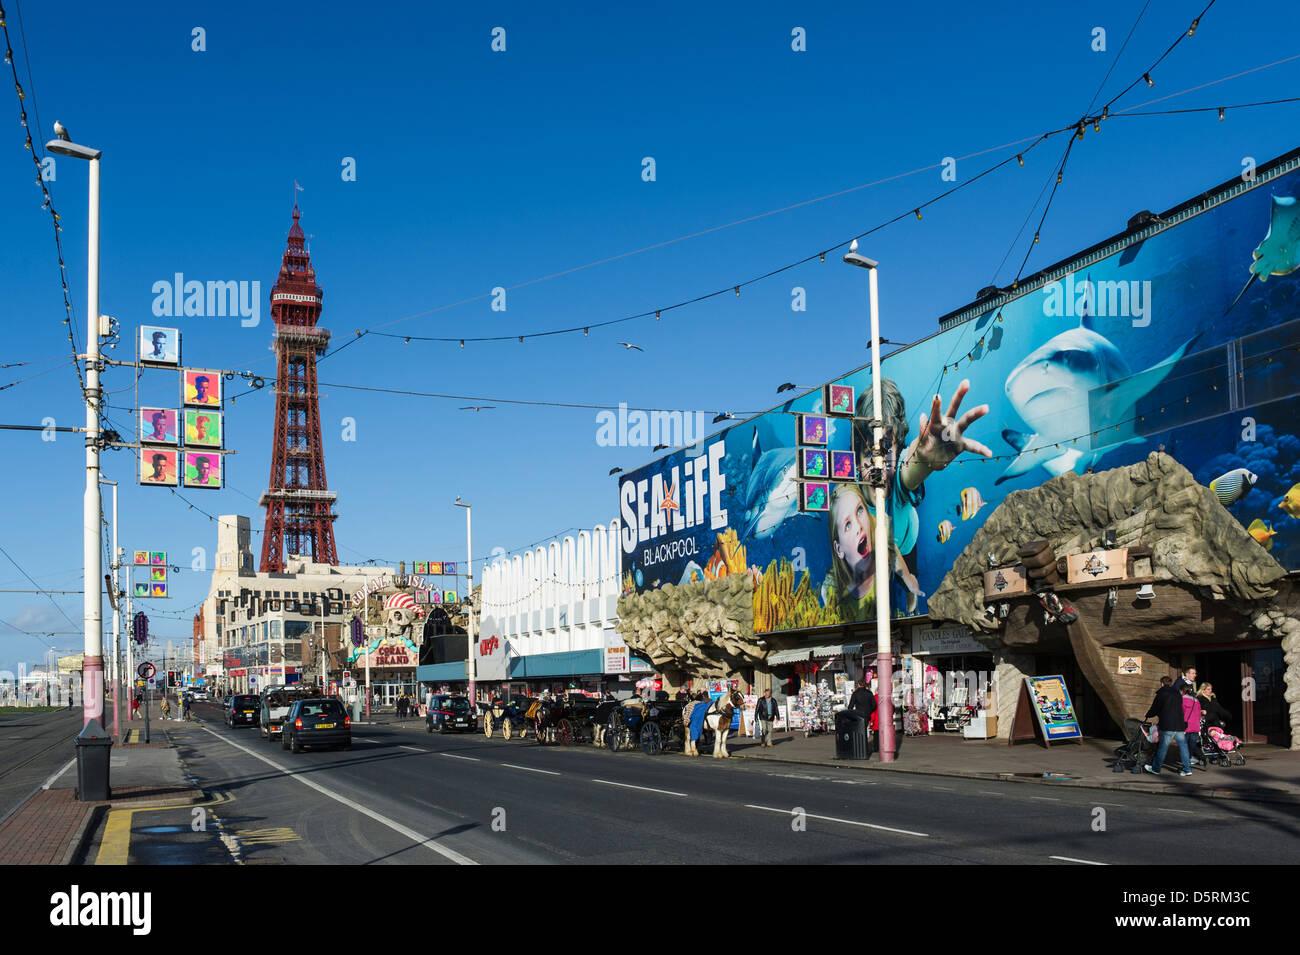 Sealife Centre and Blackpool Tower, Blackpool seafront, Lancashire, England, UK - Stock Image